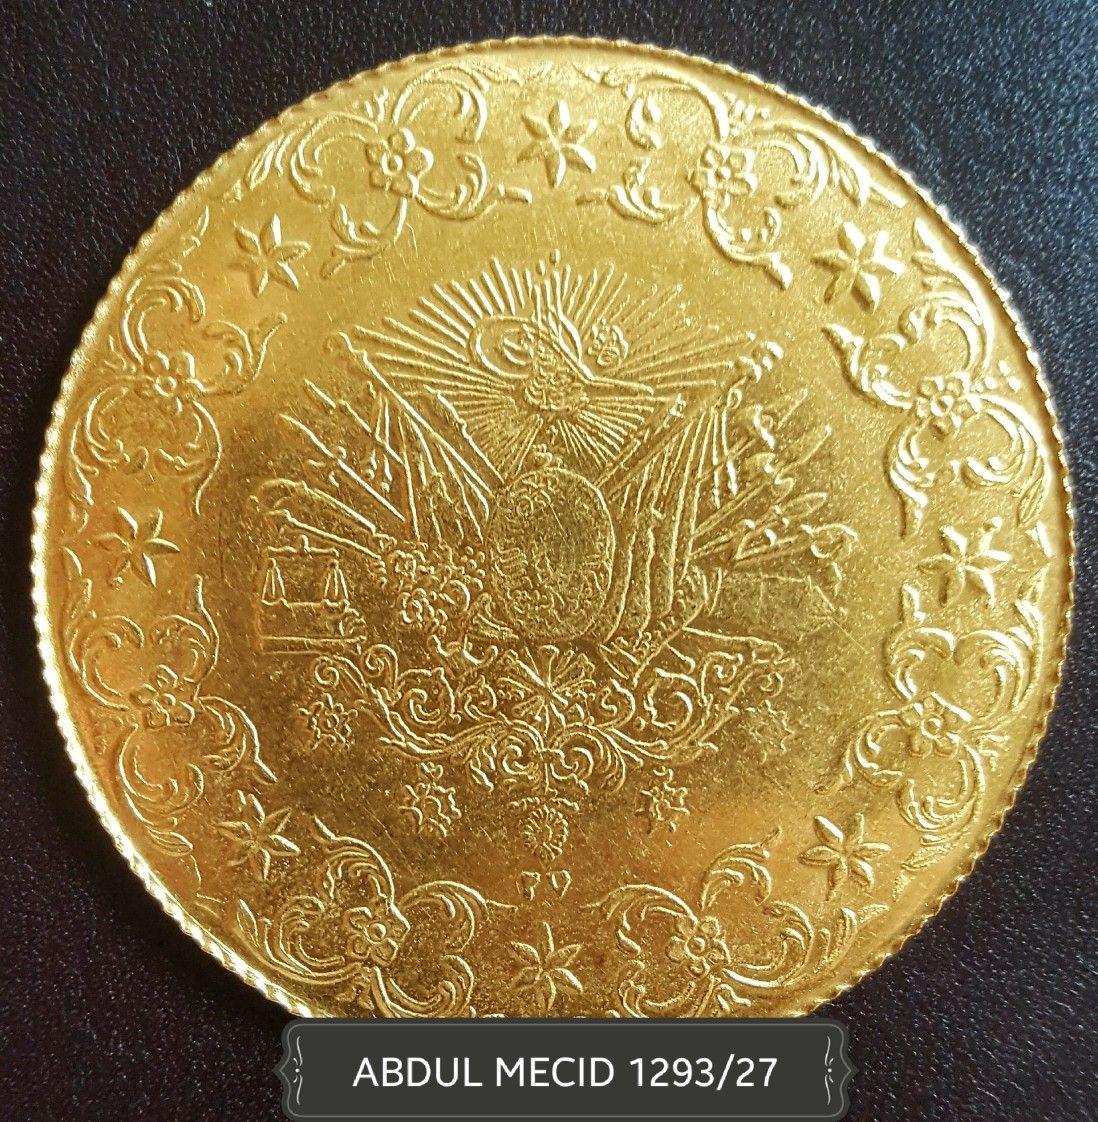 львица монетка золота фото амир олимхон настроение начало